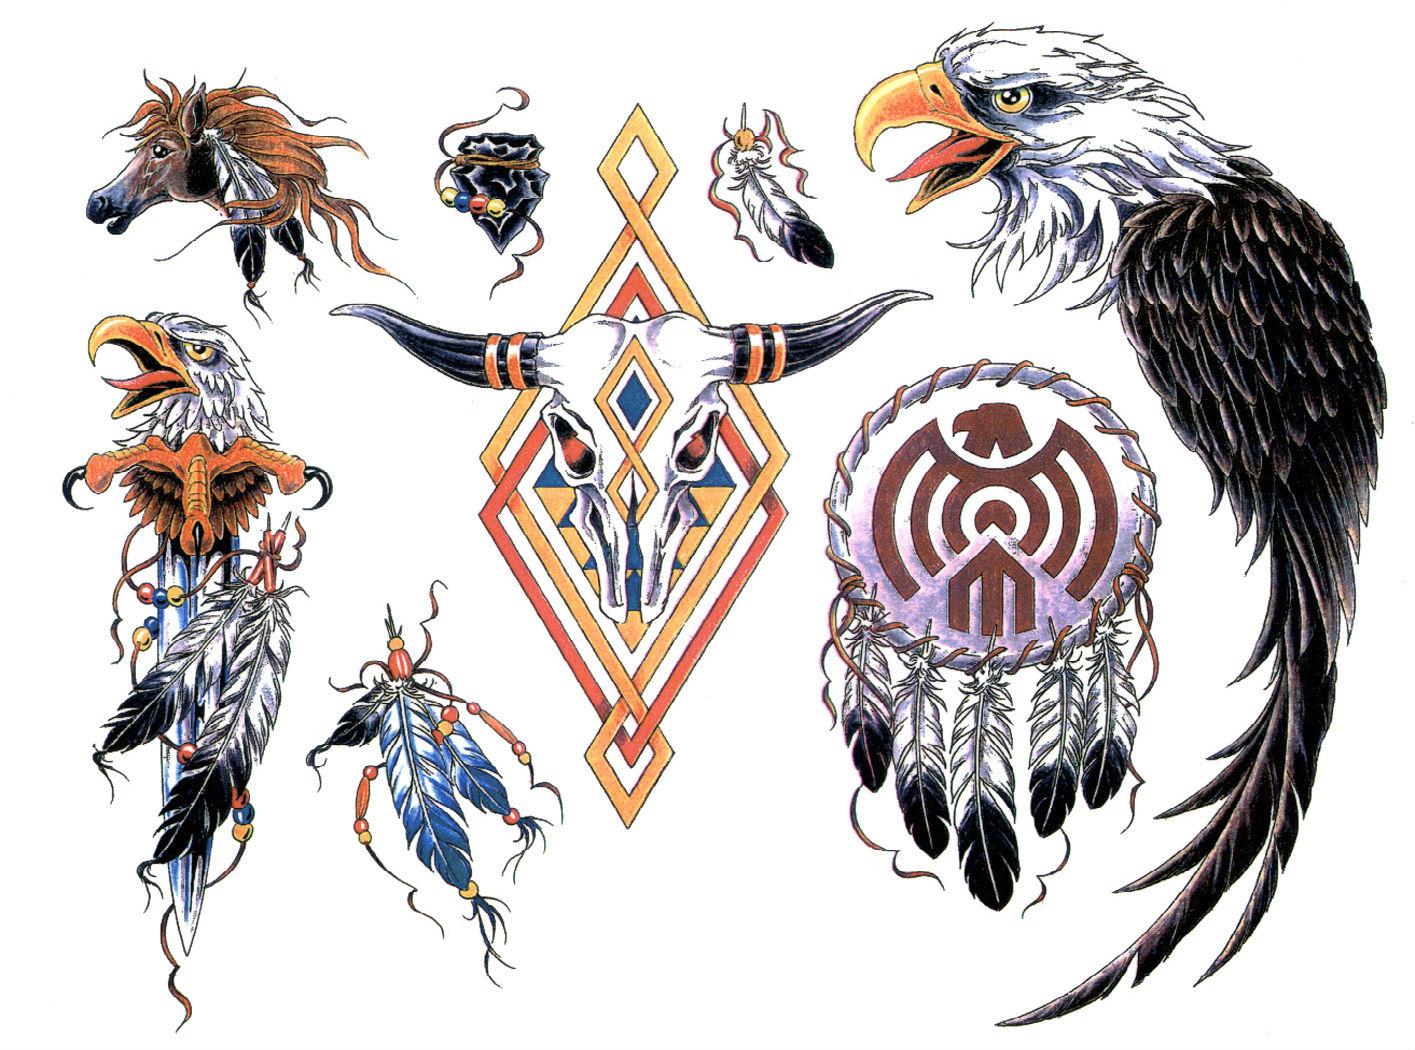 Native American Computer Wallpapers Desktop Backgrounds 1415x1050 1415x1050